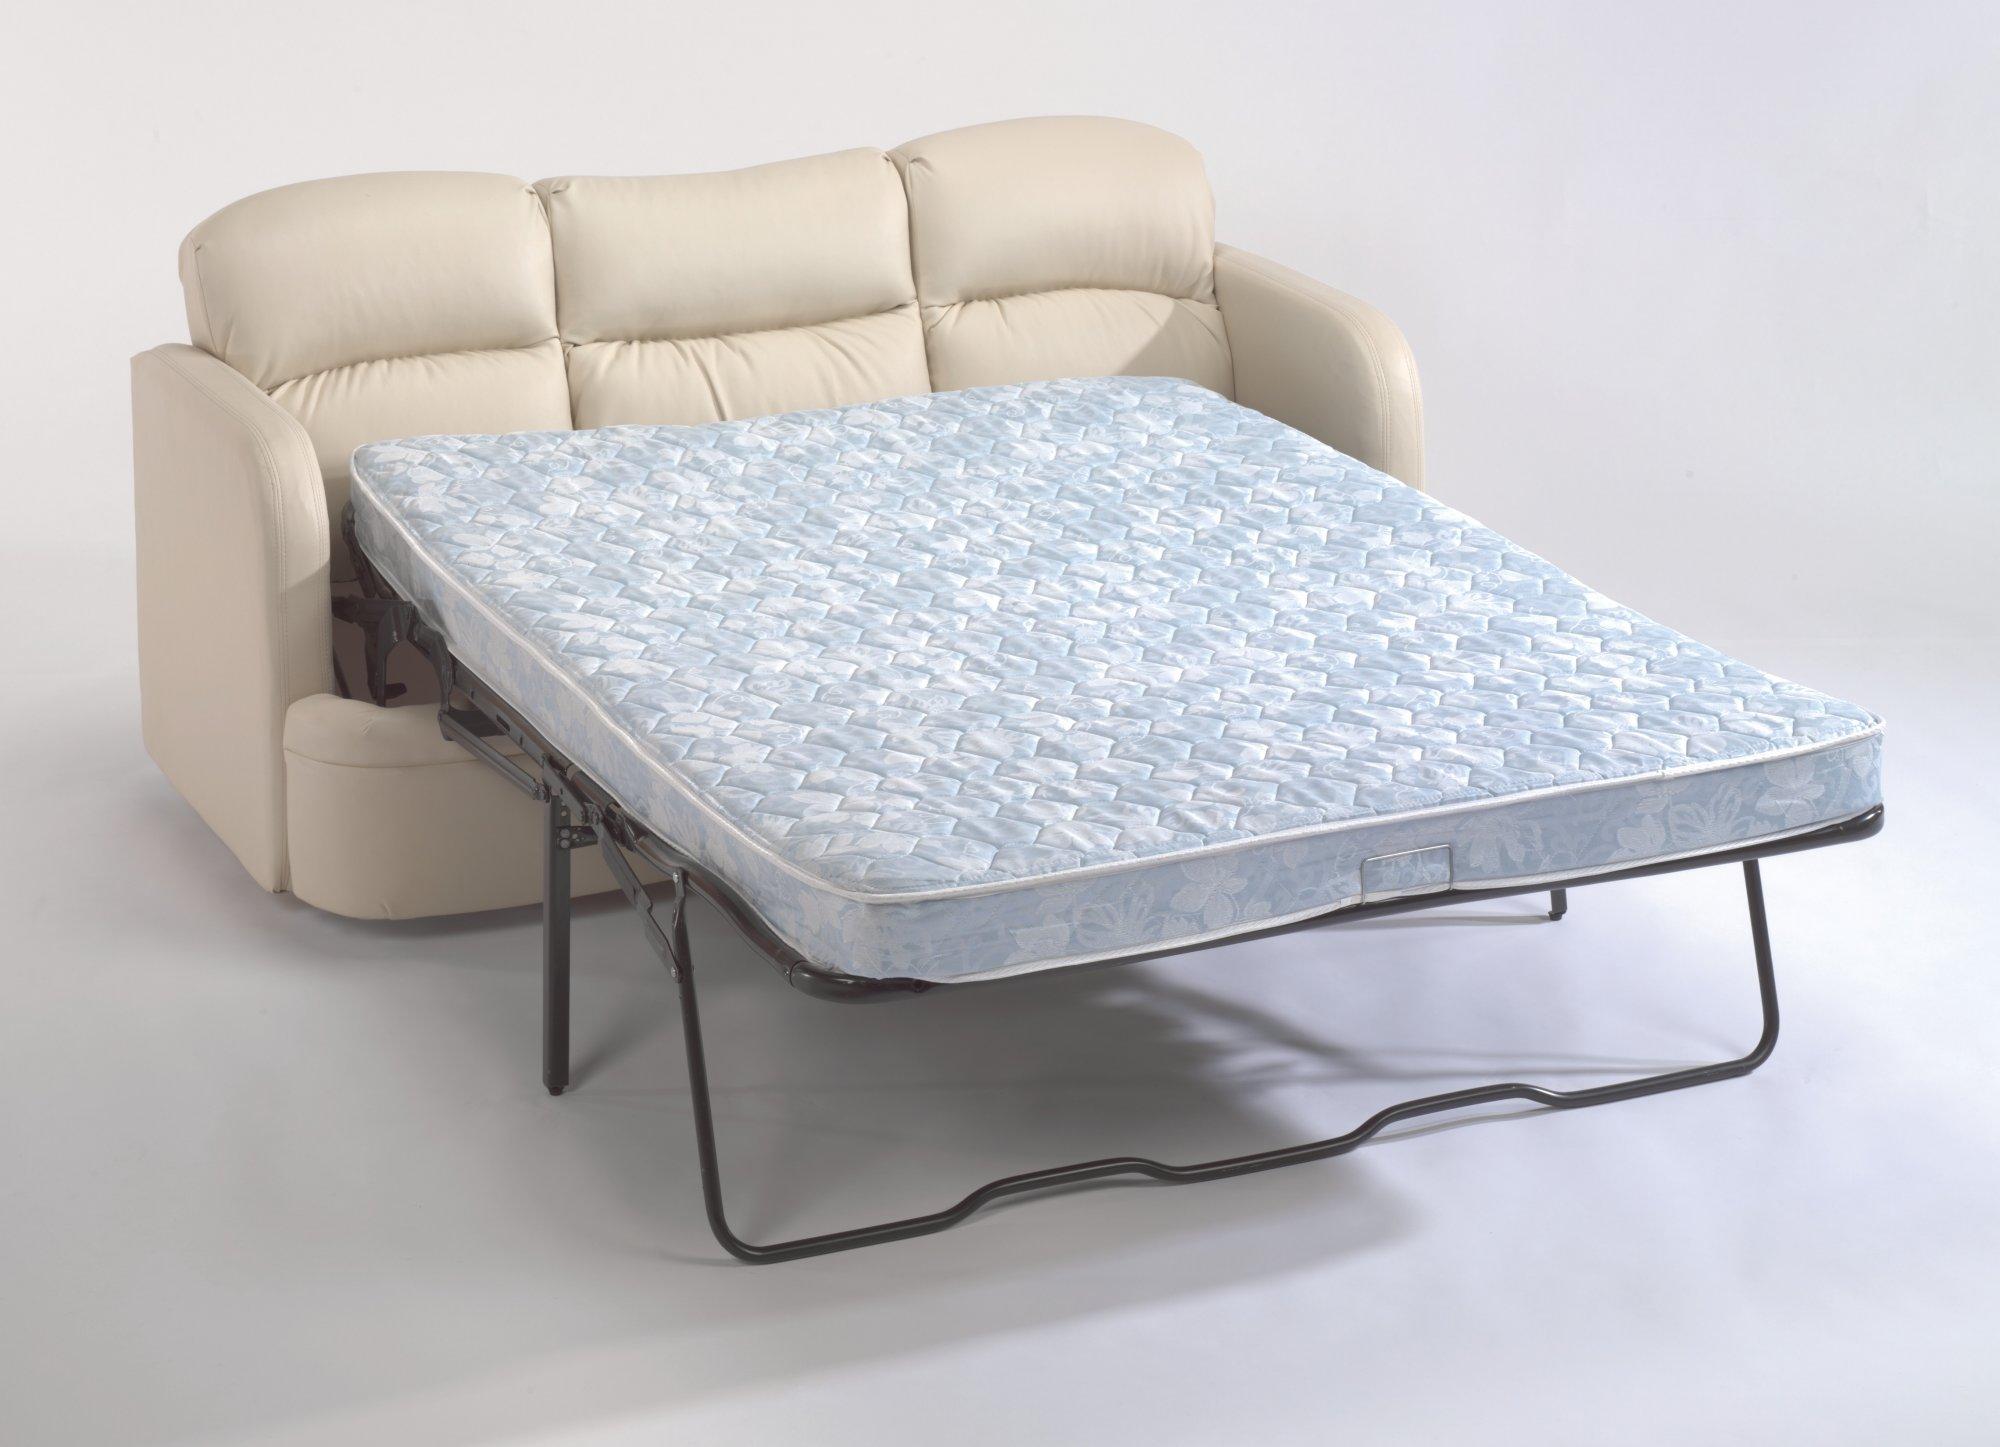 Flexsteel Recliners For Rv Flexsteel Sleeper Sofa For Rv